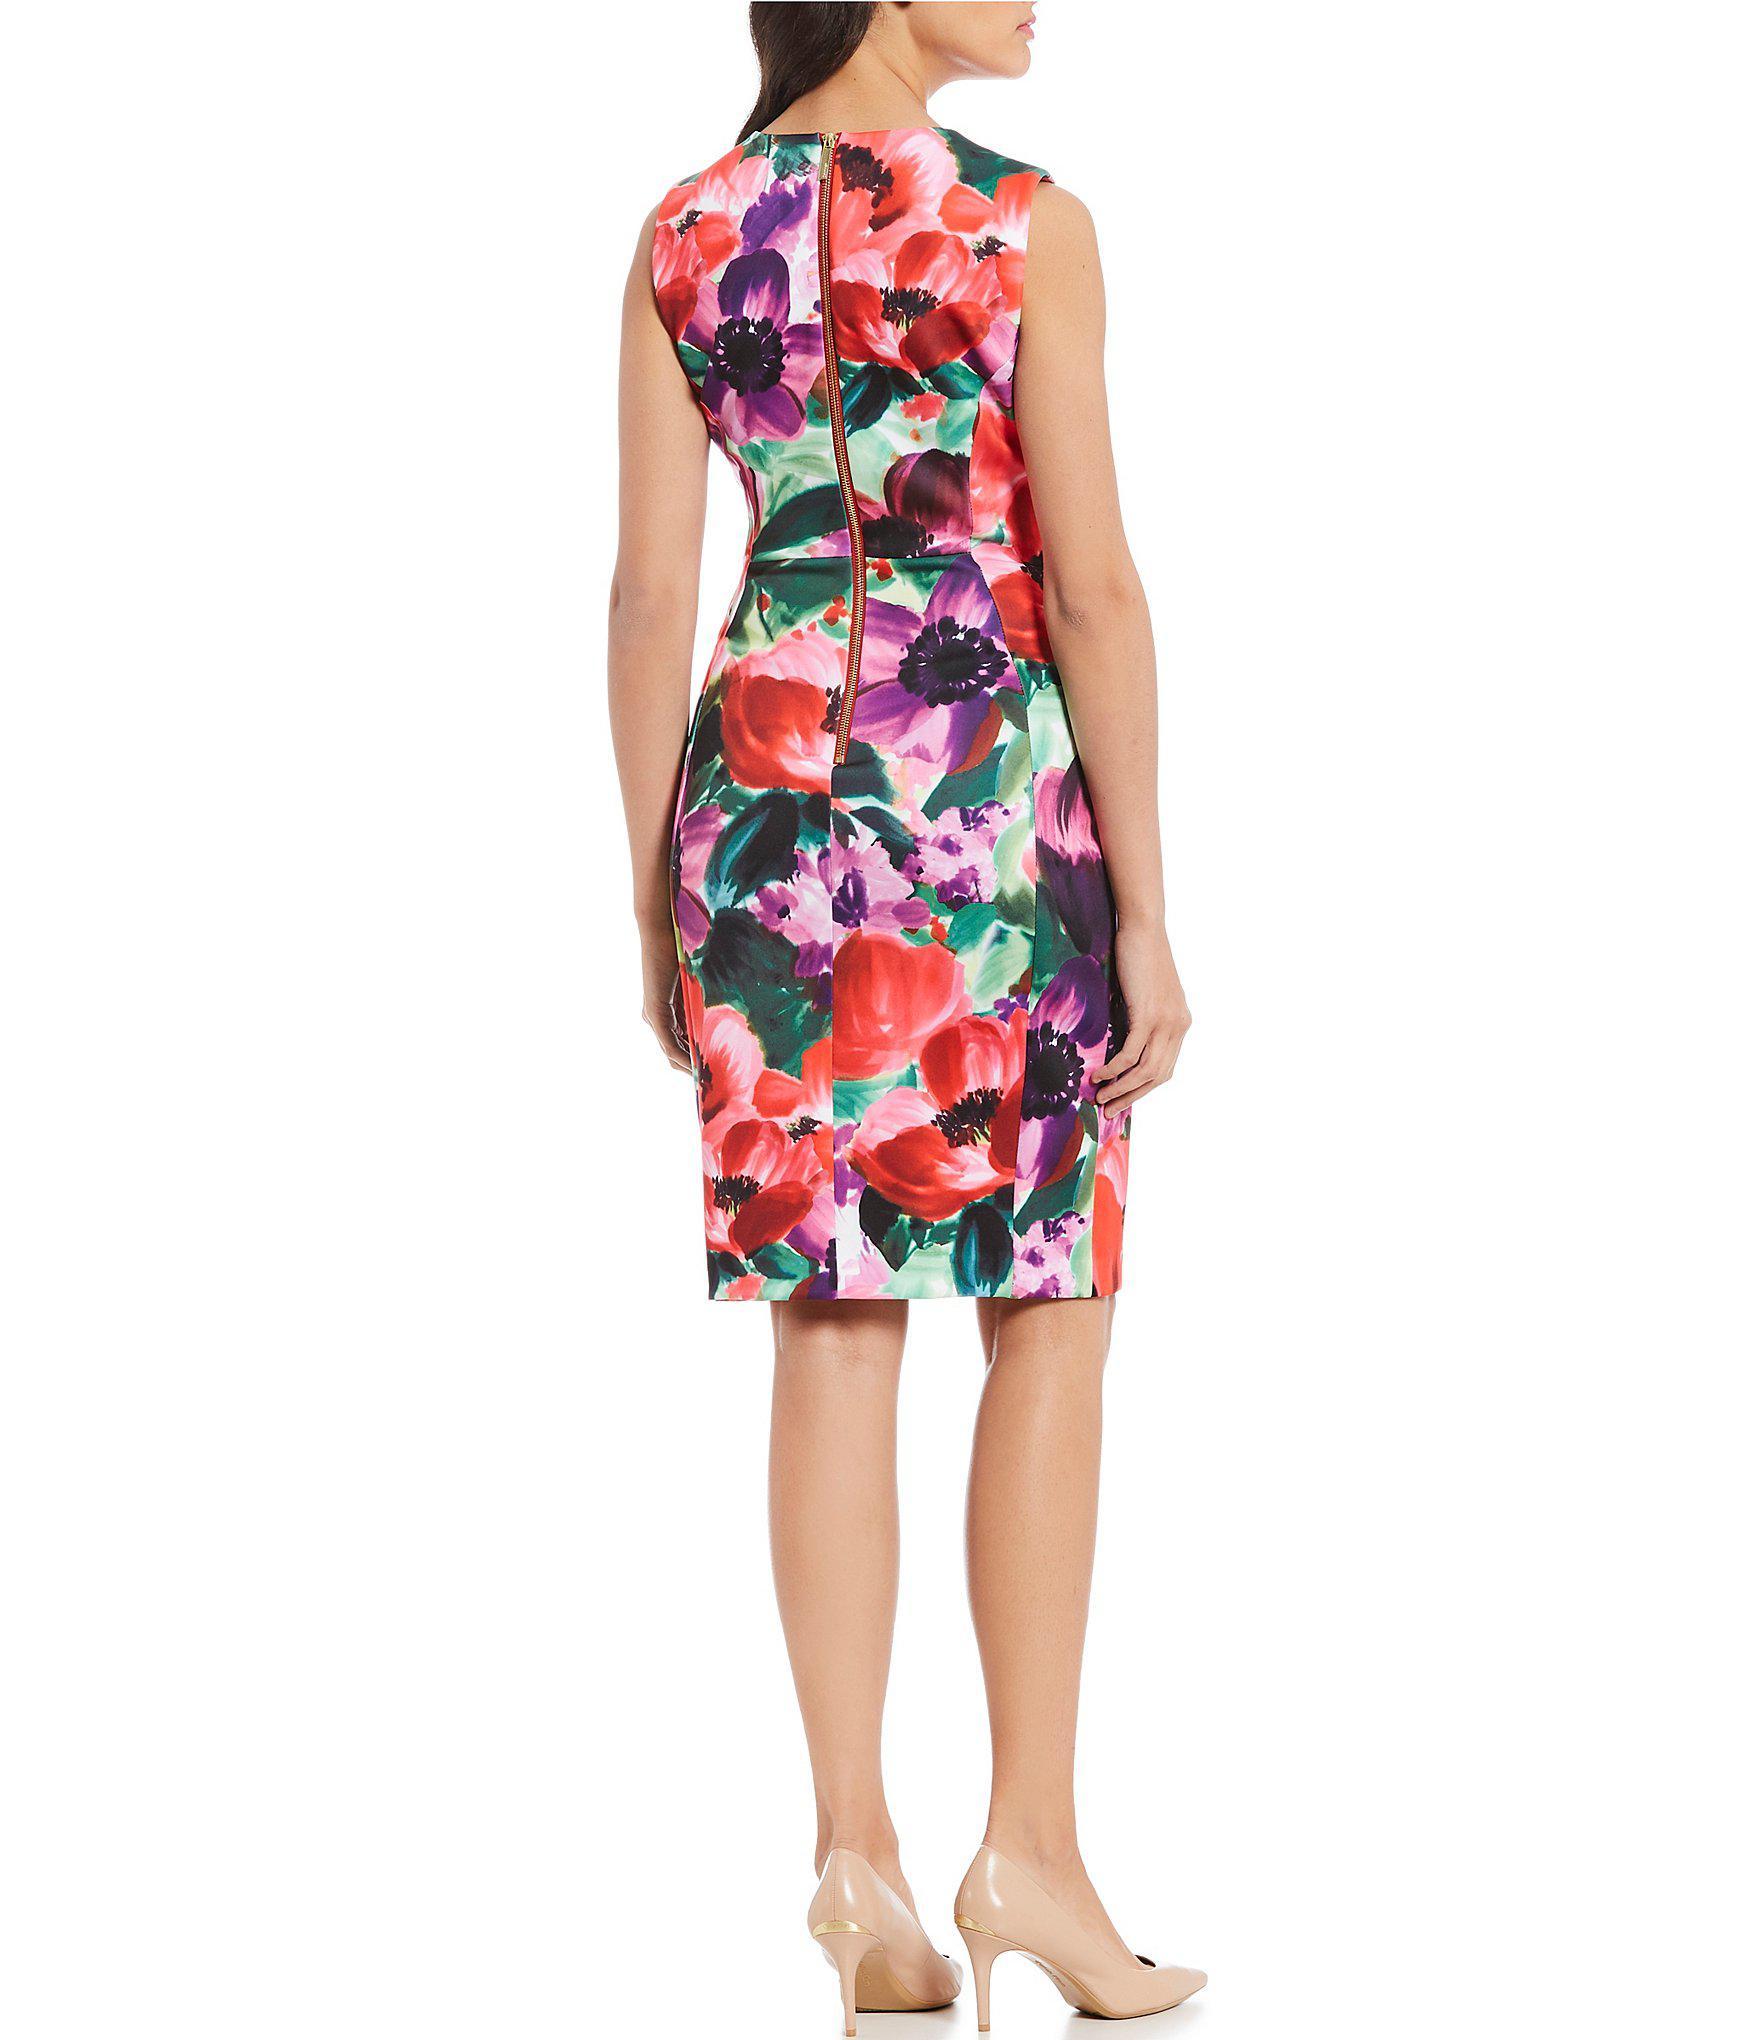 4c201d49 Calvin Klein - Red Floral Print Scuba Sleeveless Sheath Dress - Lyst. View  fullscreen